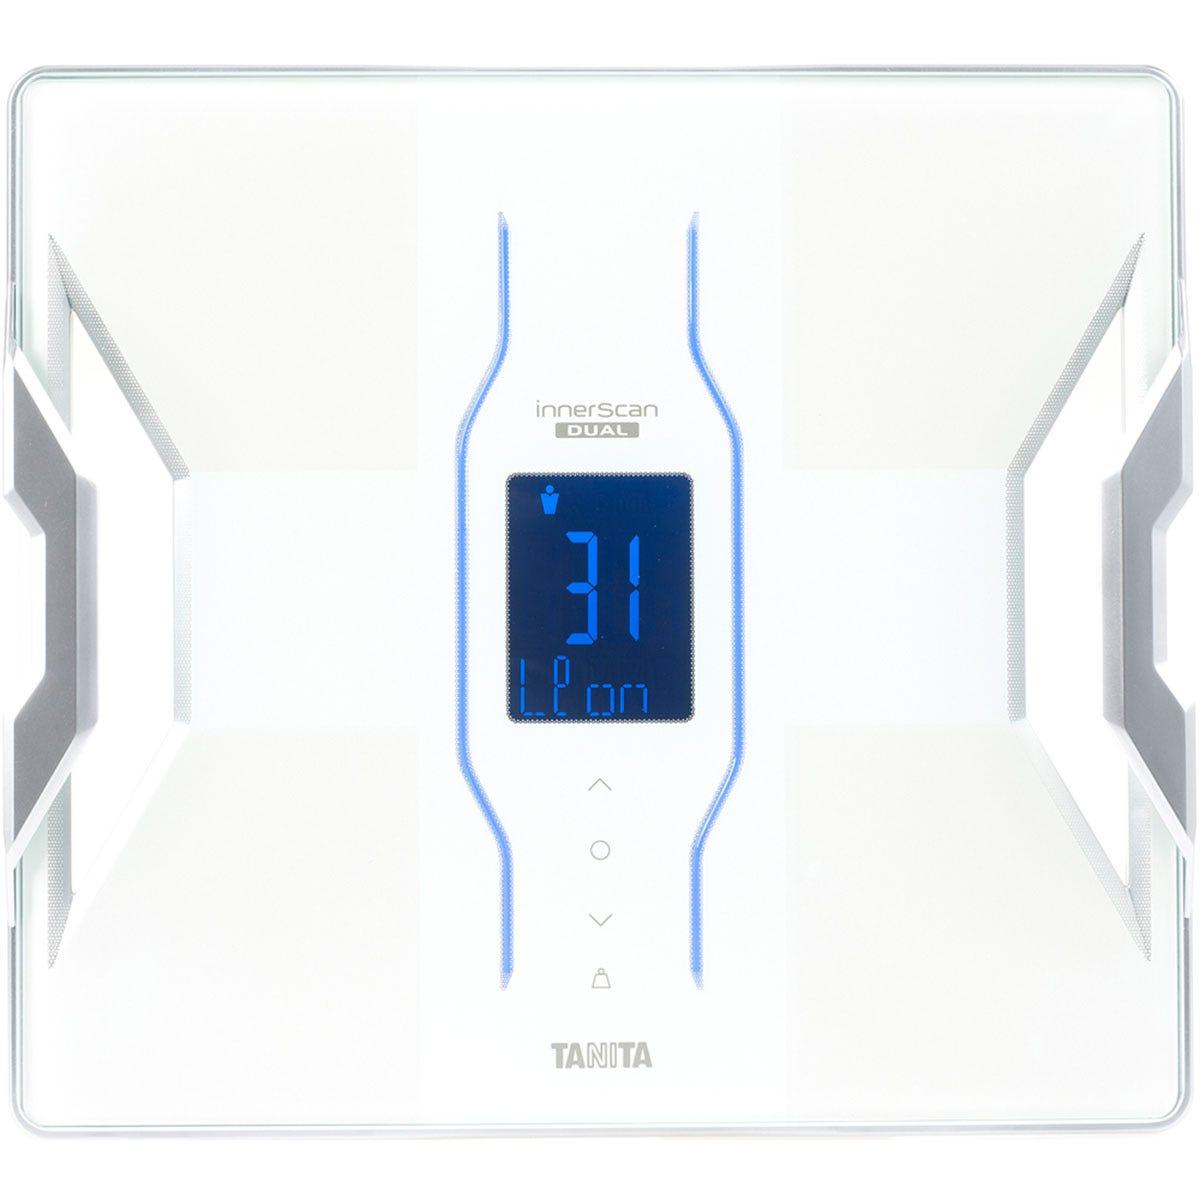 TANITA InnerScan Dual RD-953 Smart Scale - White, White